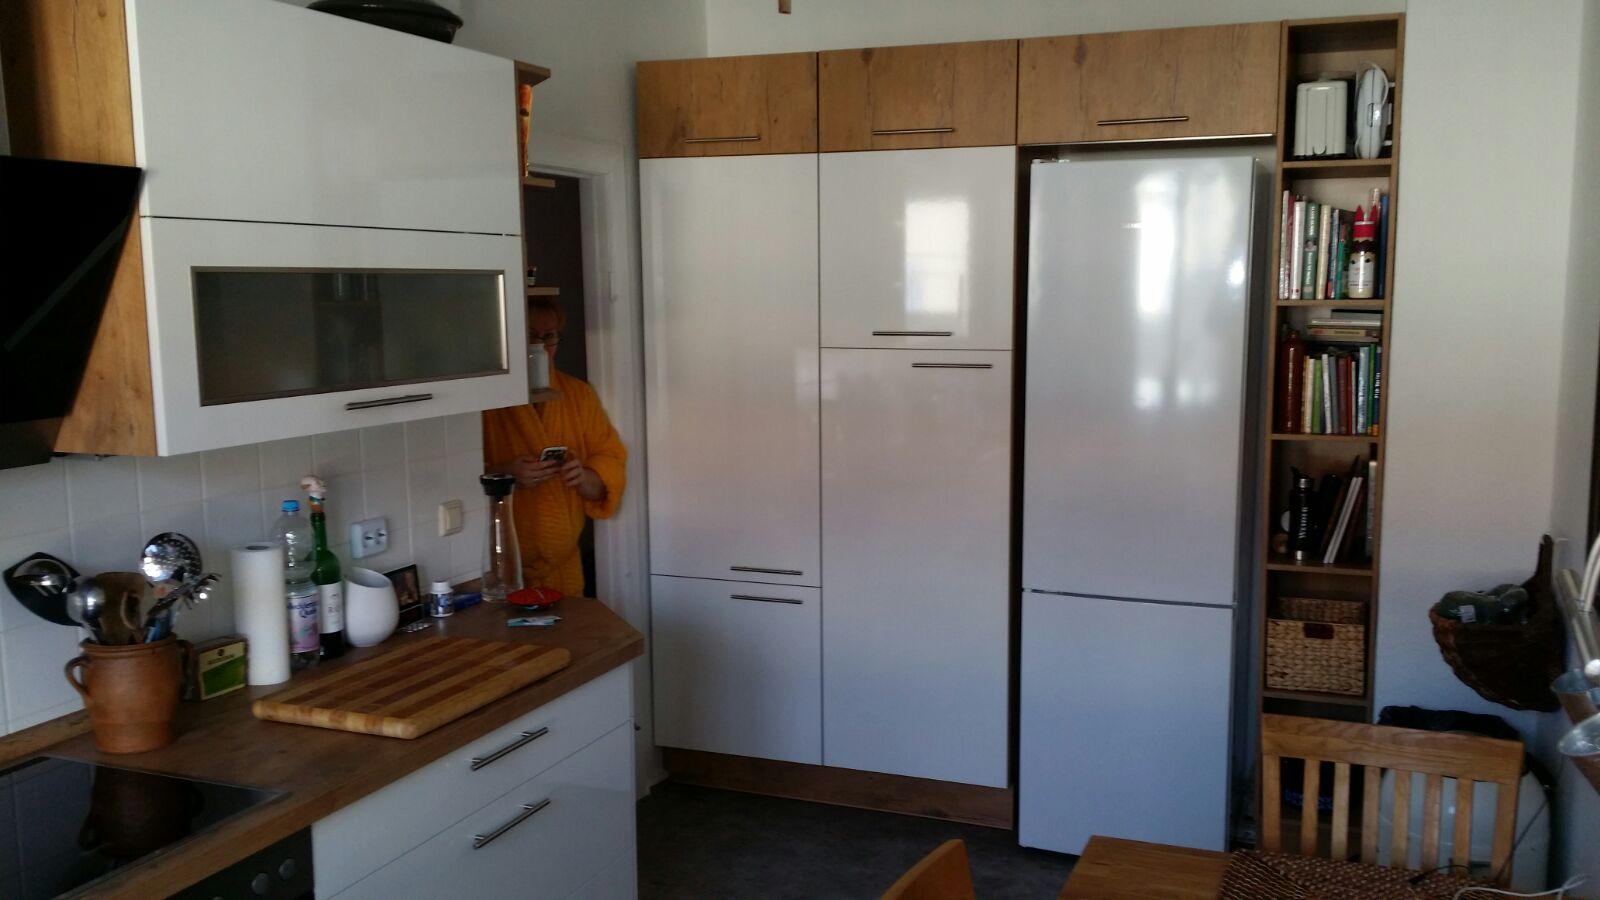 einbaukuechen preiswert k chen herbert storkow baut marken k chen m rz 2016. Black Bedroom Furniture Sets. Home Design Ideas